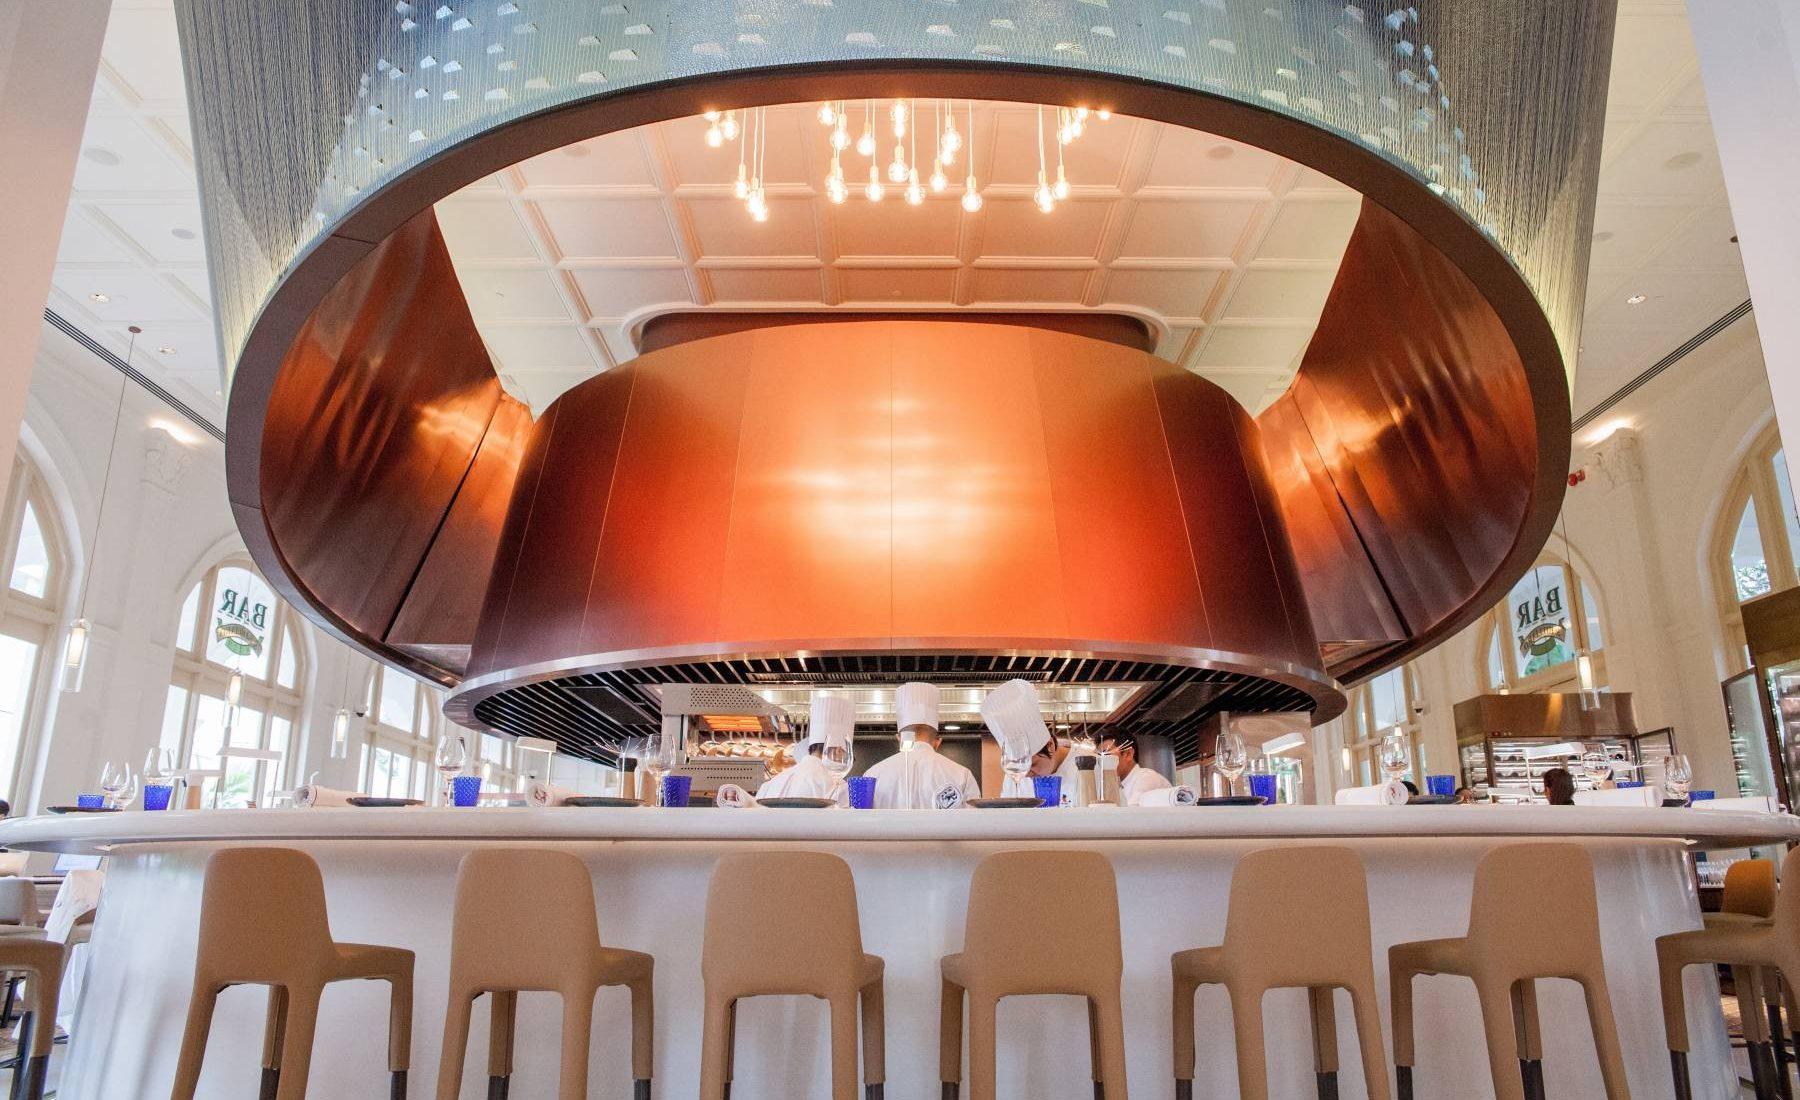 Raffles Singapore - BBR by Alain Ducasse